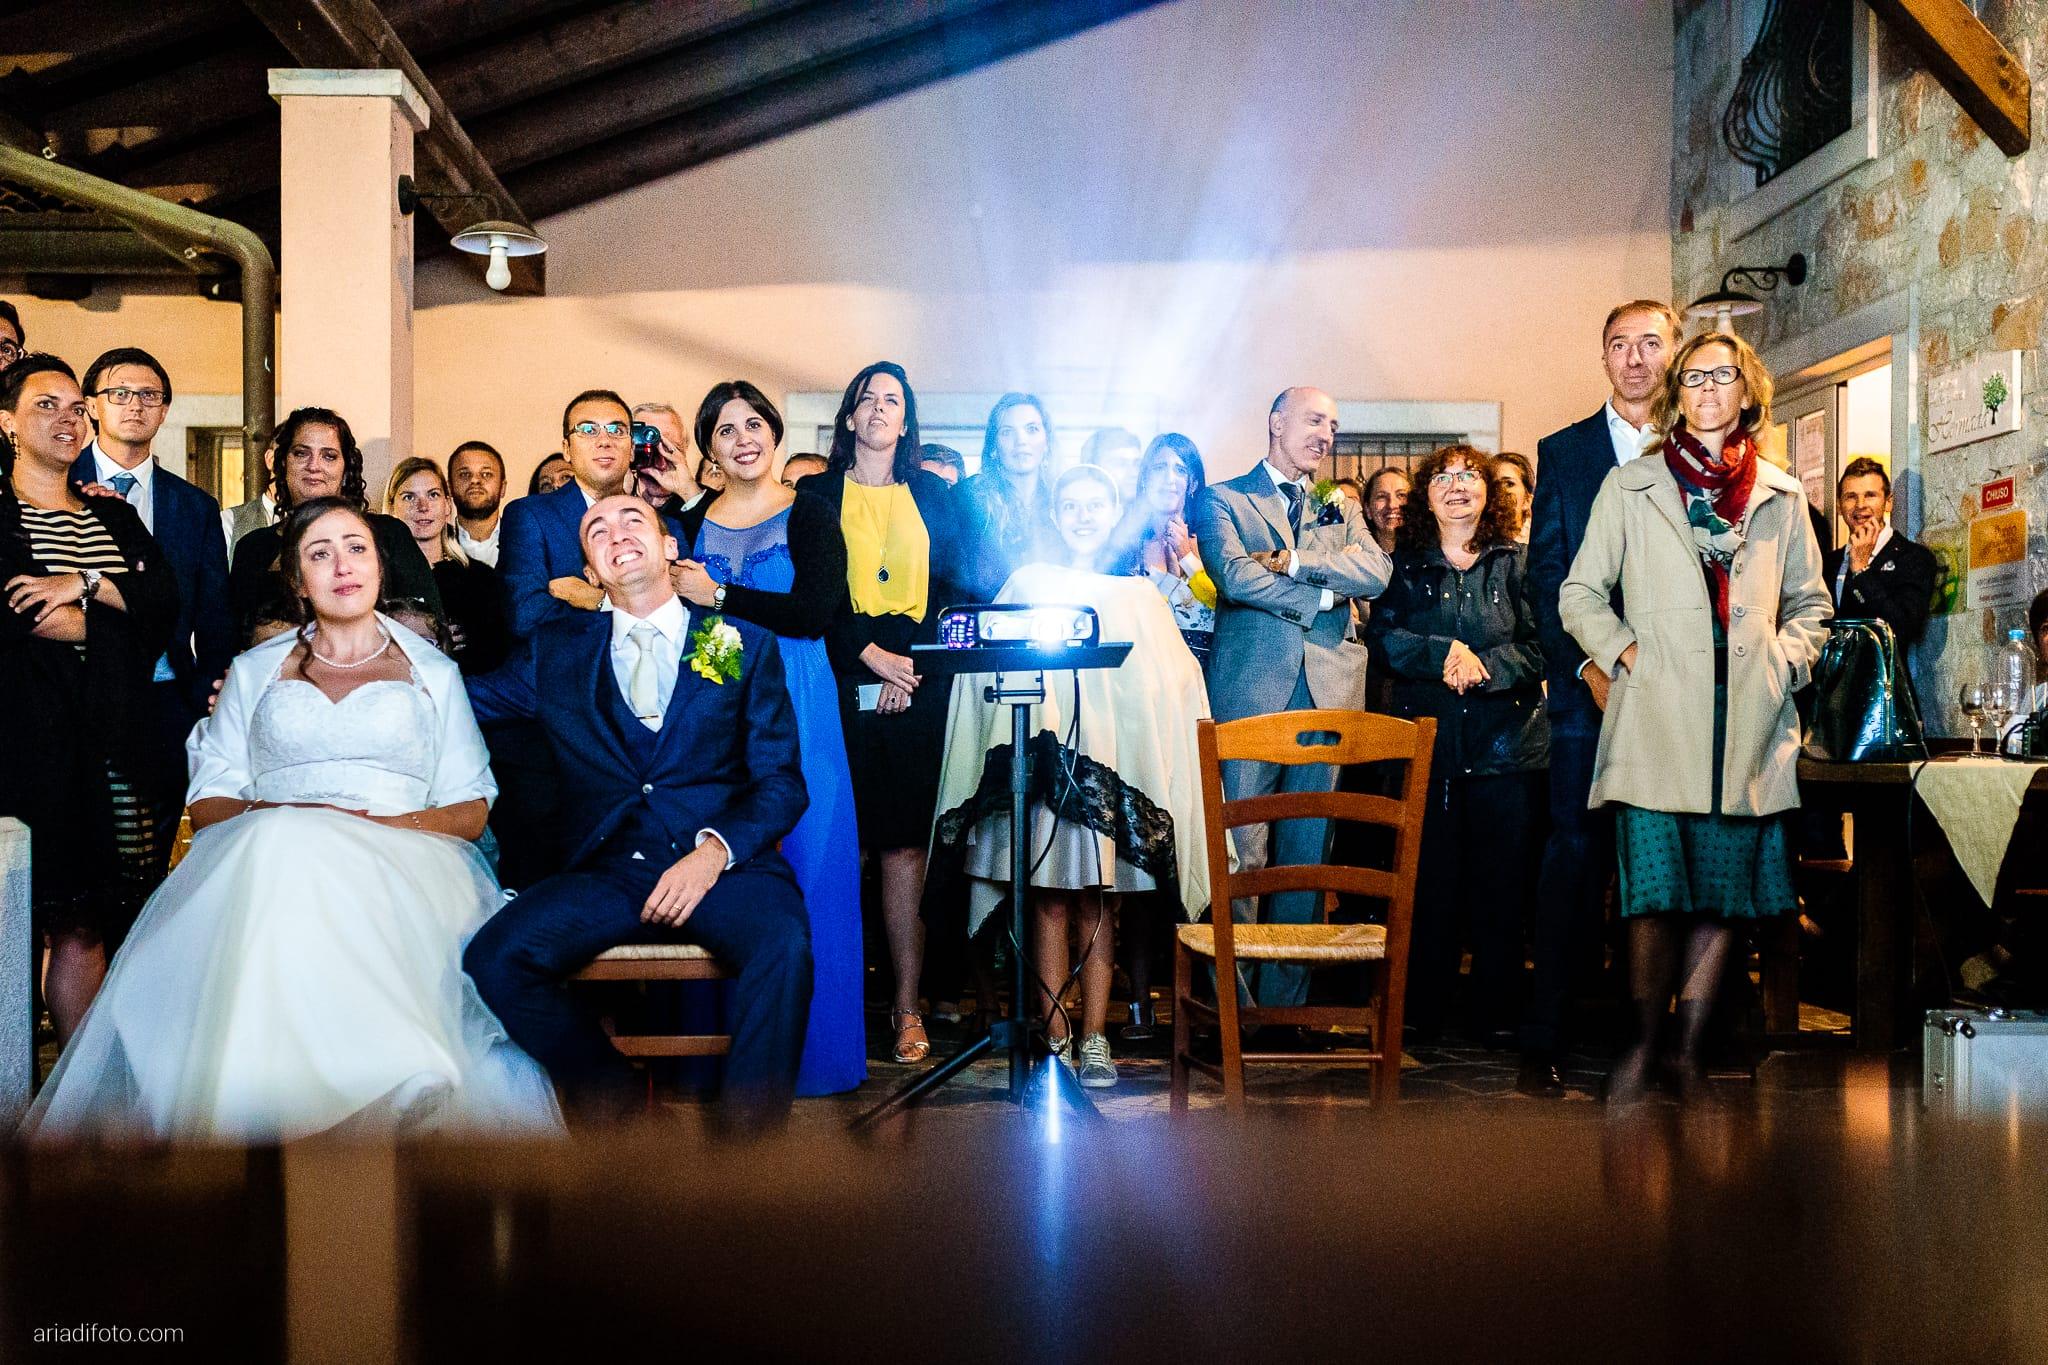 Maria Emanuela Fabio Matrimonio Muggia Porto Vecchio Agriturismo Hermada Duino Trieste ricevimento proiezione Live!